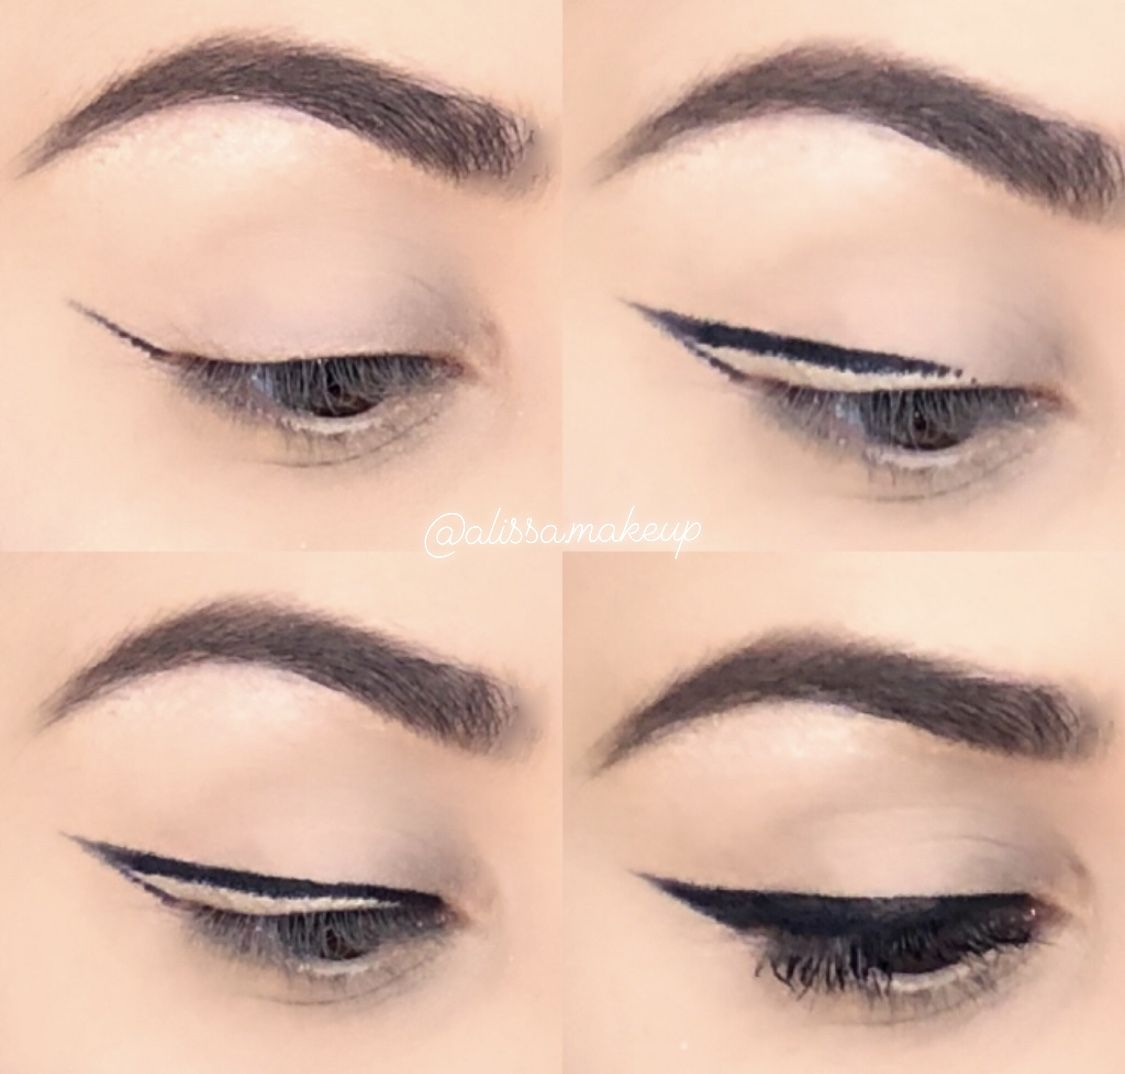 Delineador de gatinho 🖤 Winged Eyeliner   Dicas de maquilhagem ...